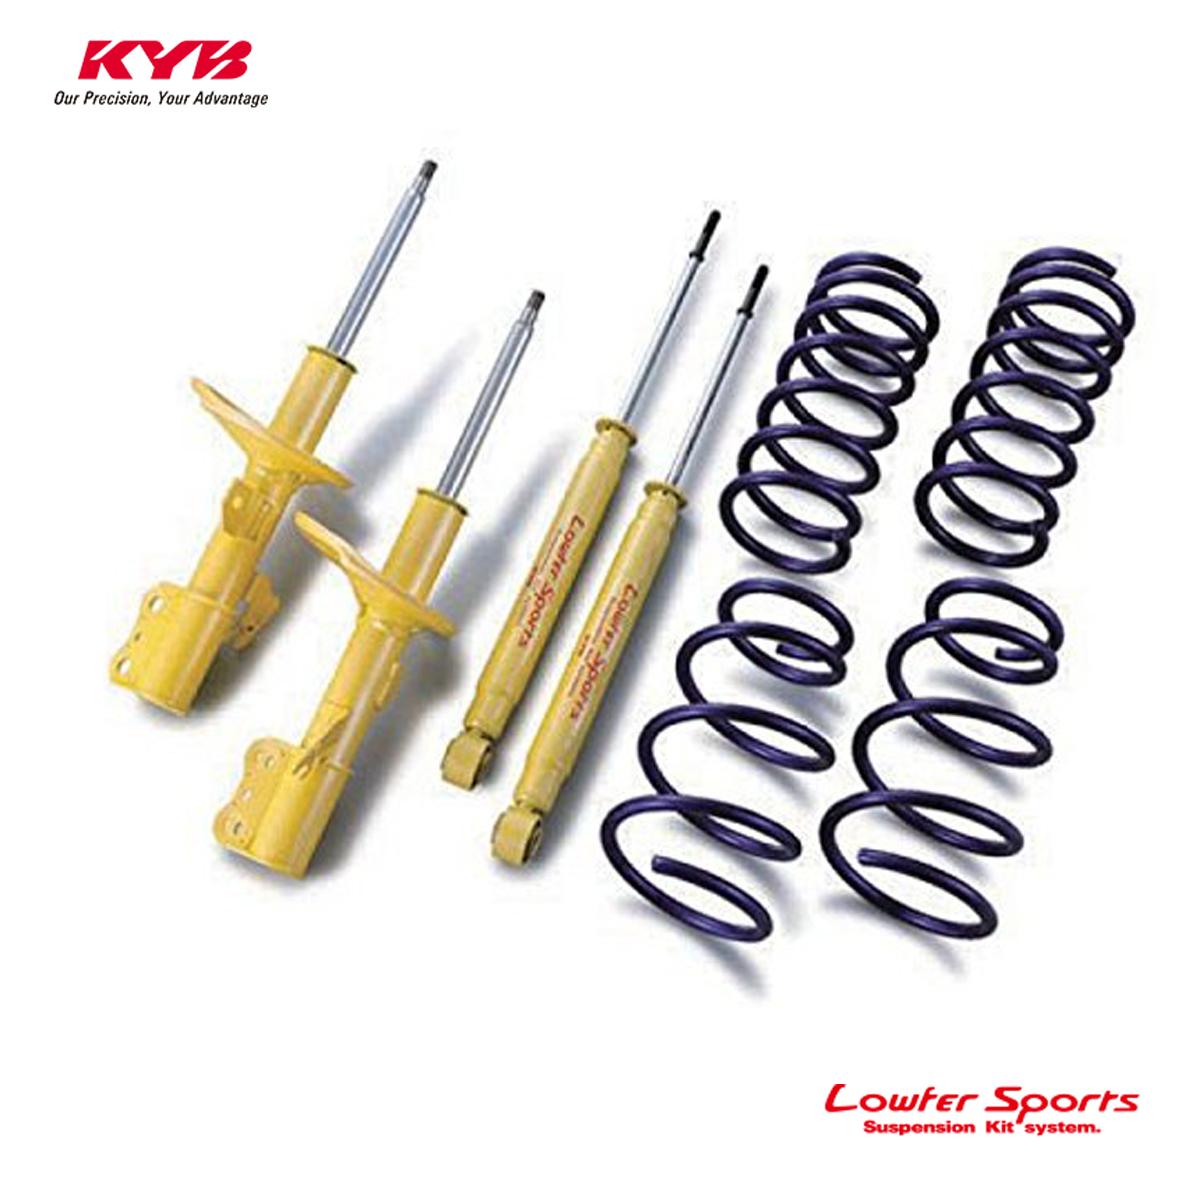 KYB カヤバ デミオ DE3FS ショックアブソーバー サスペンションキット Lowfer Sports LKIT-DE3FS 配送先条件有り